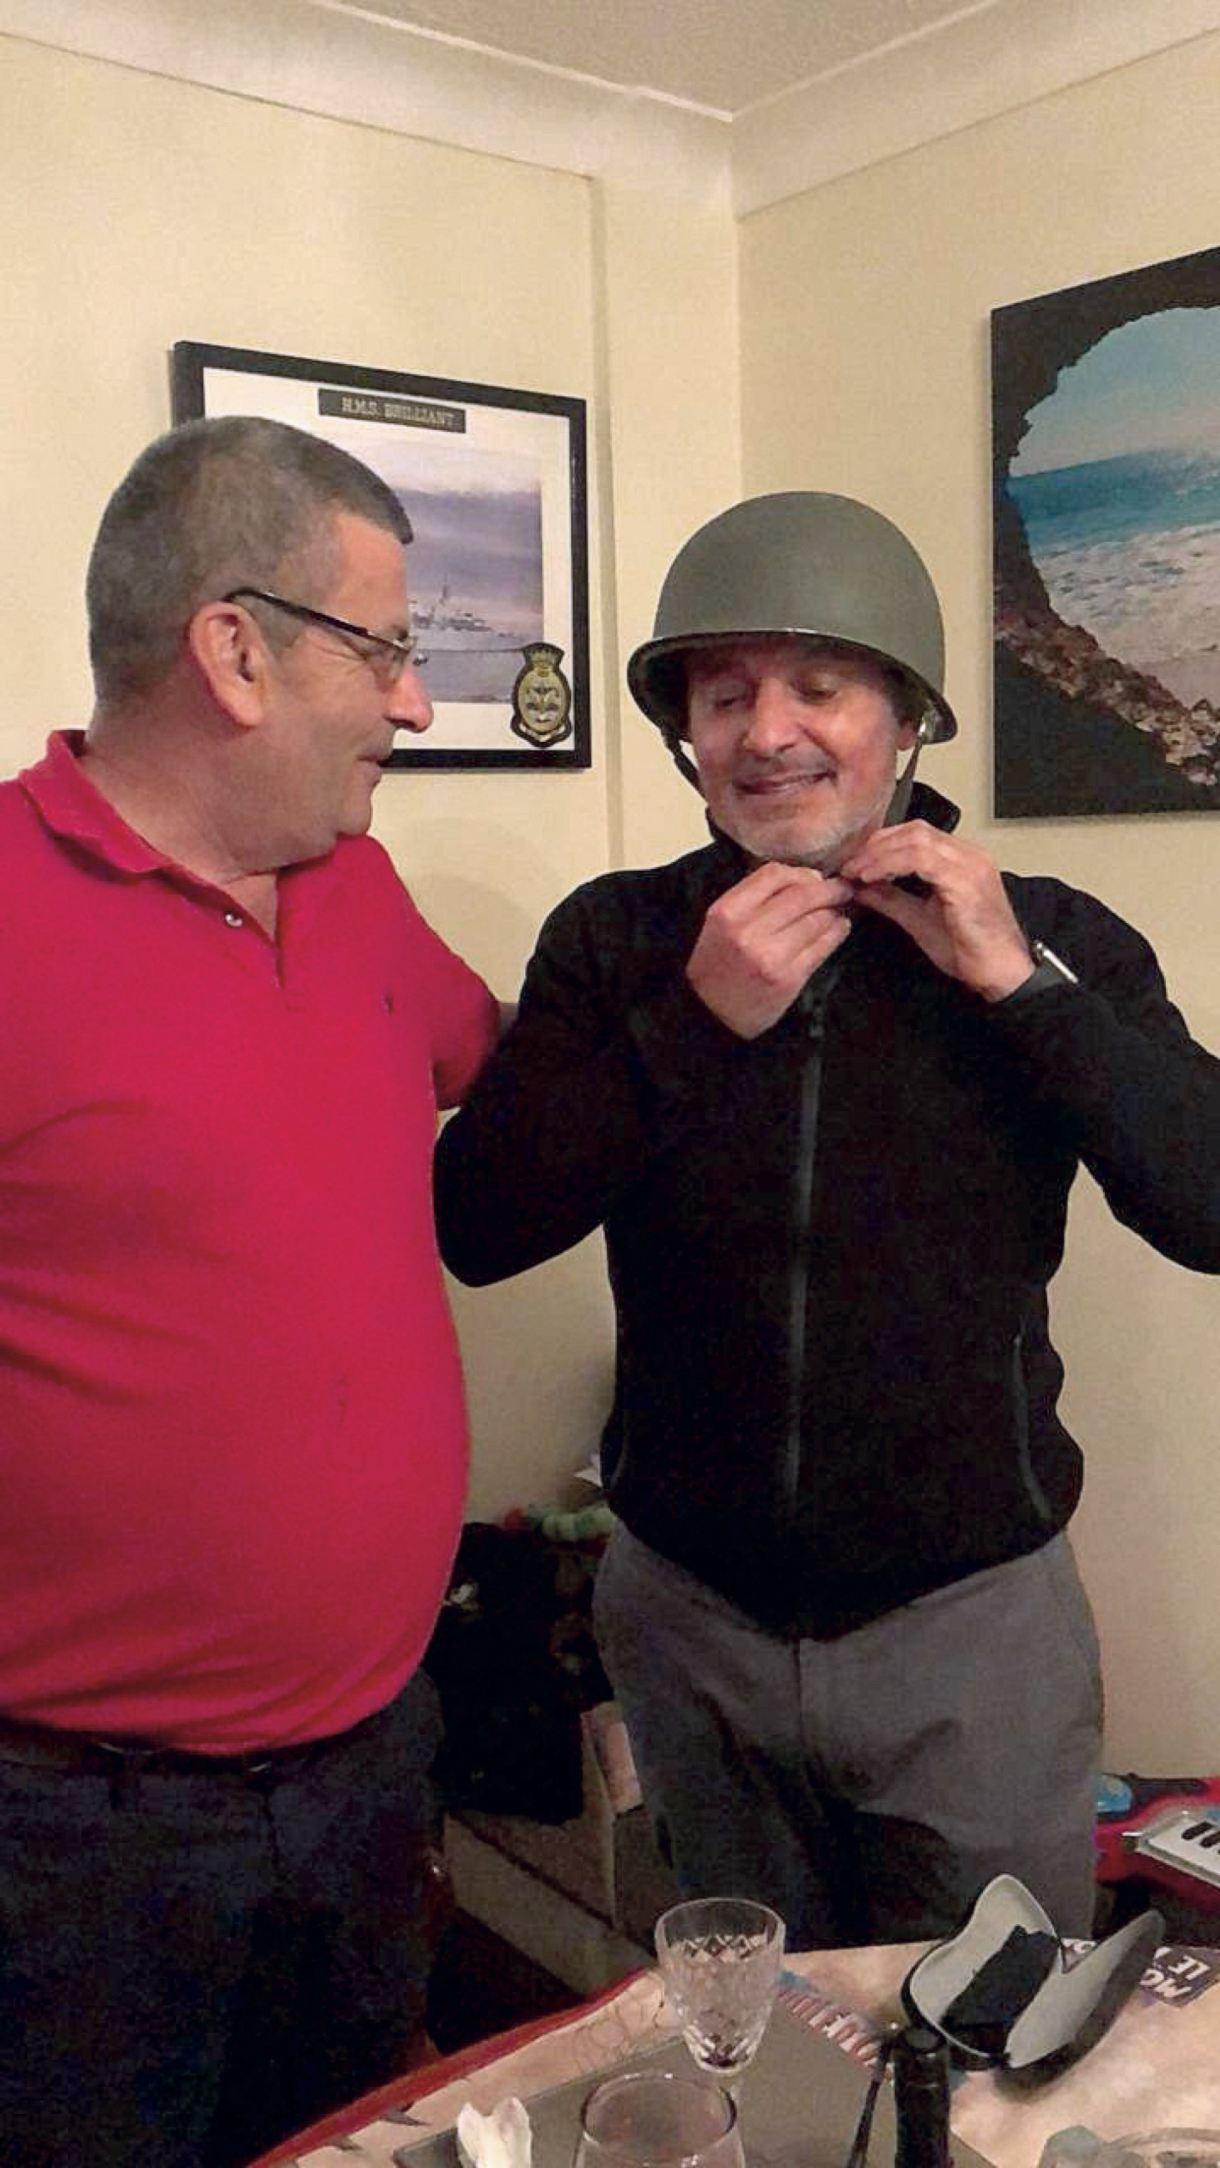 Edward Goodall le da el casco que acompañó a Alejandro durante todos sus días en Malvinas. Gorzelany, emocionado, le agredeció profundamente.